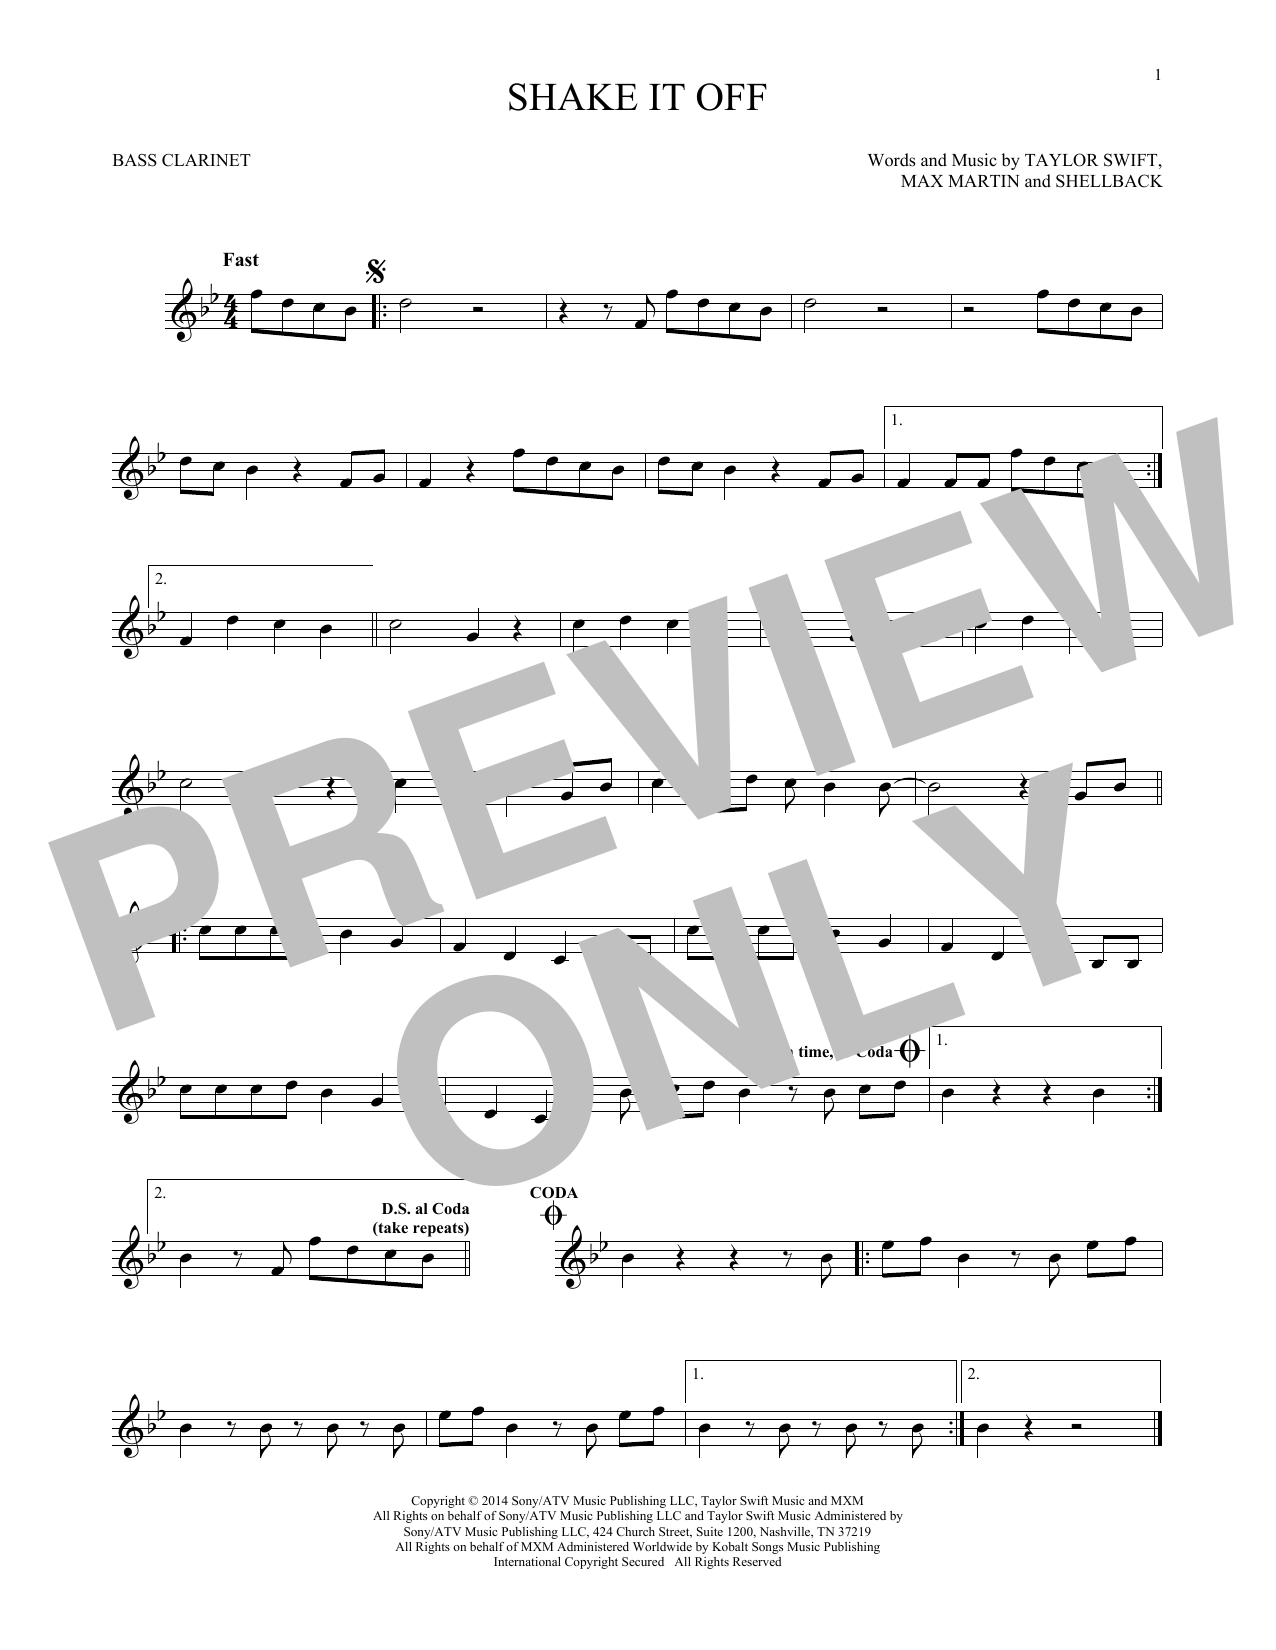 Shake It Off (Bass Clarinet Solo)